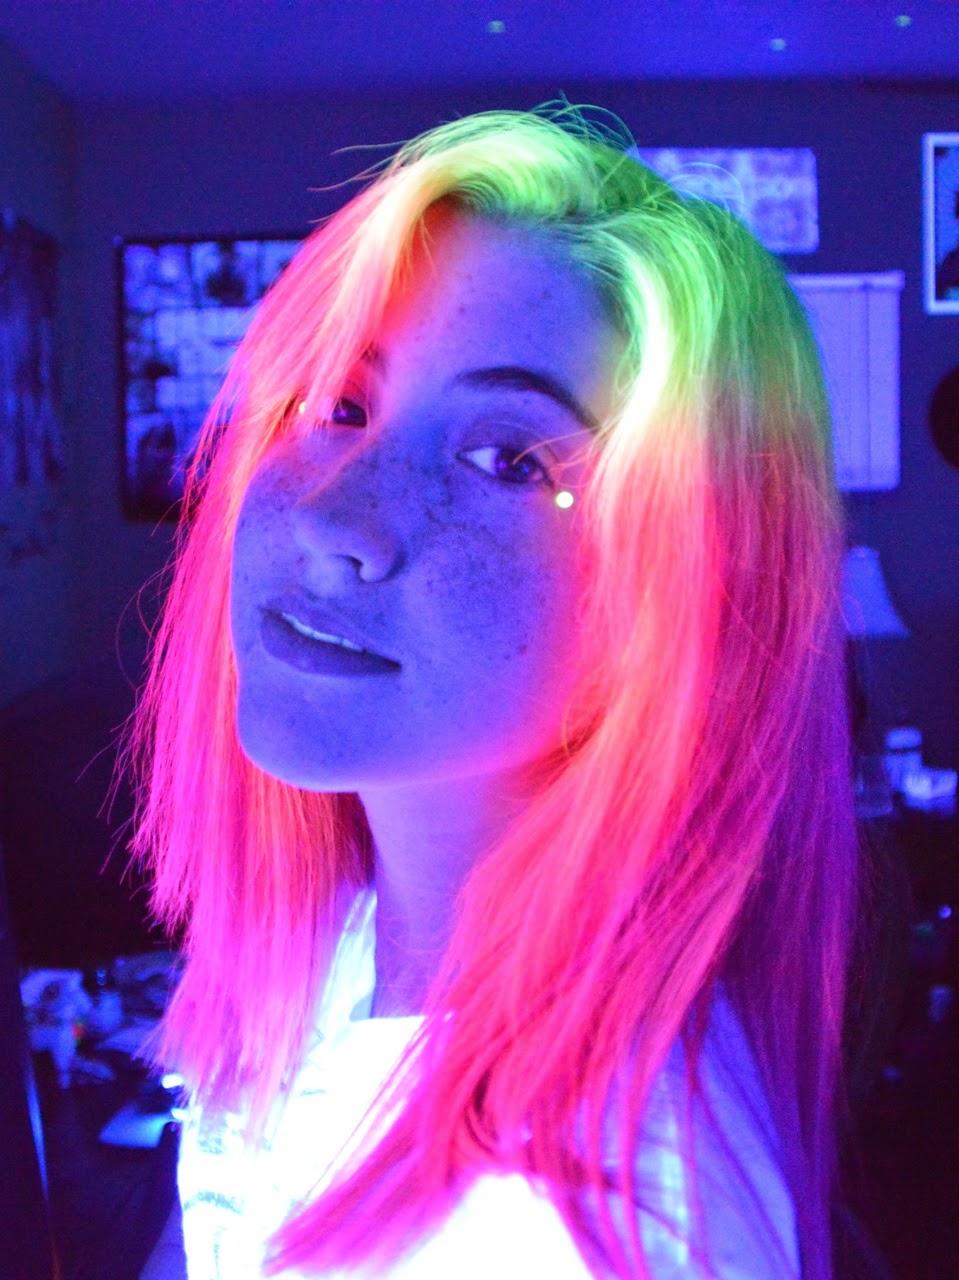 Cabelo Neon Tumblr10